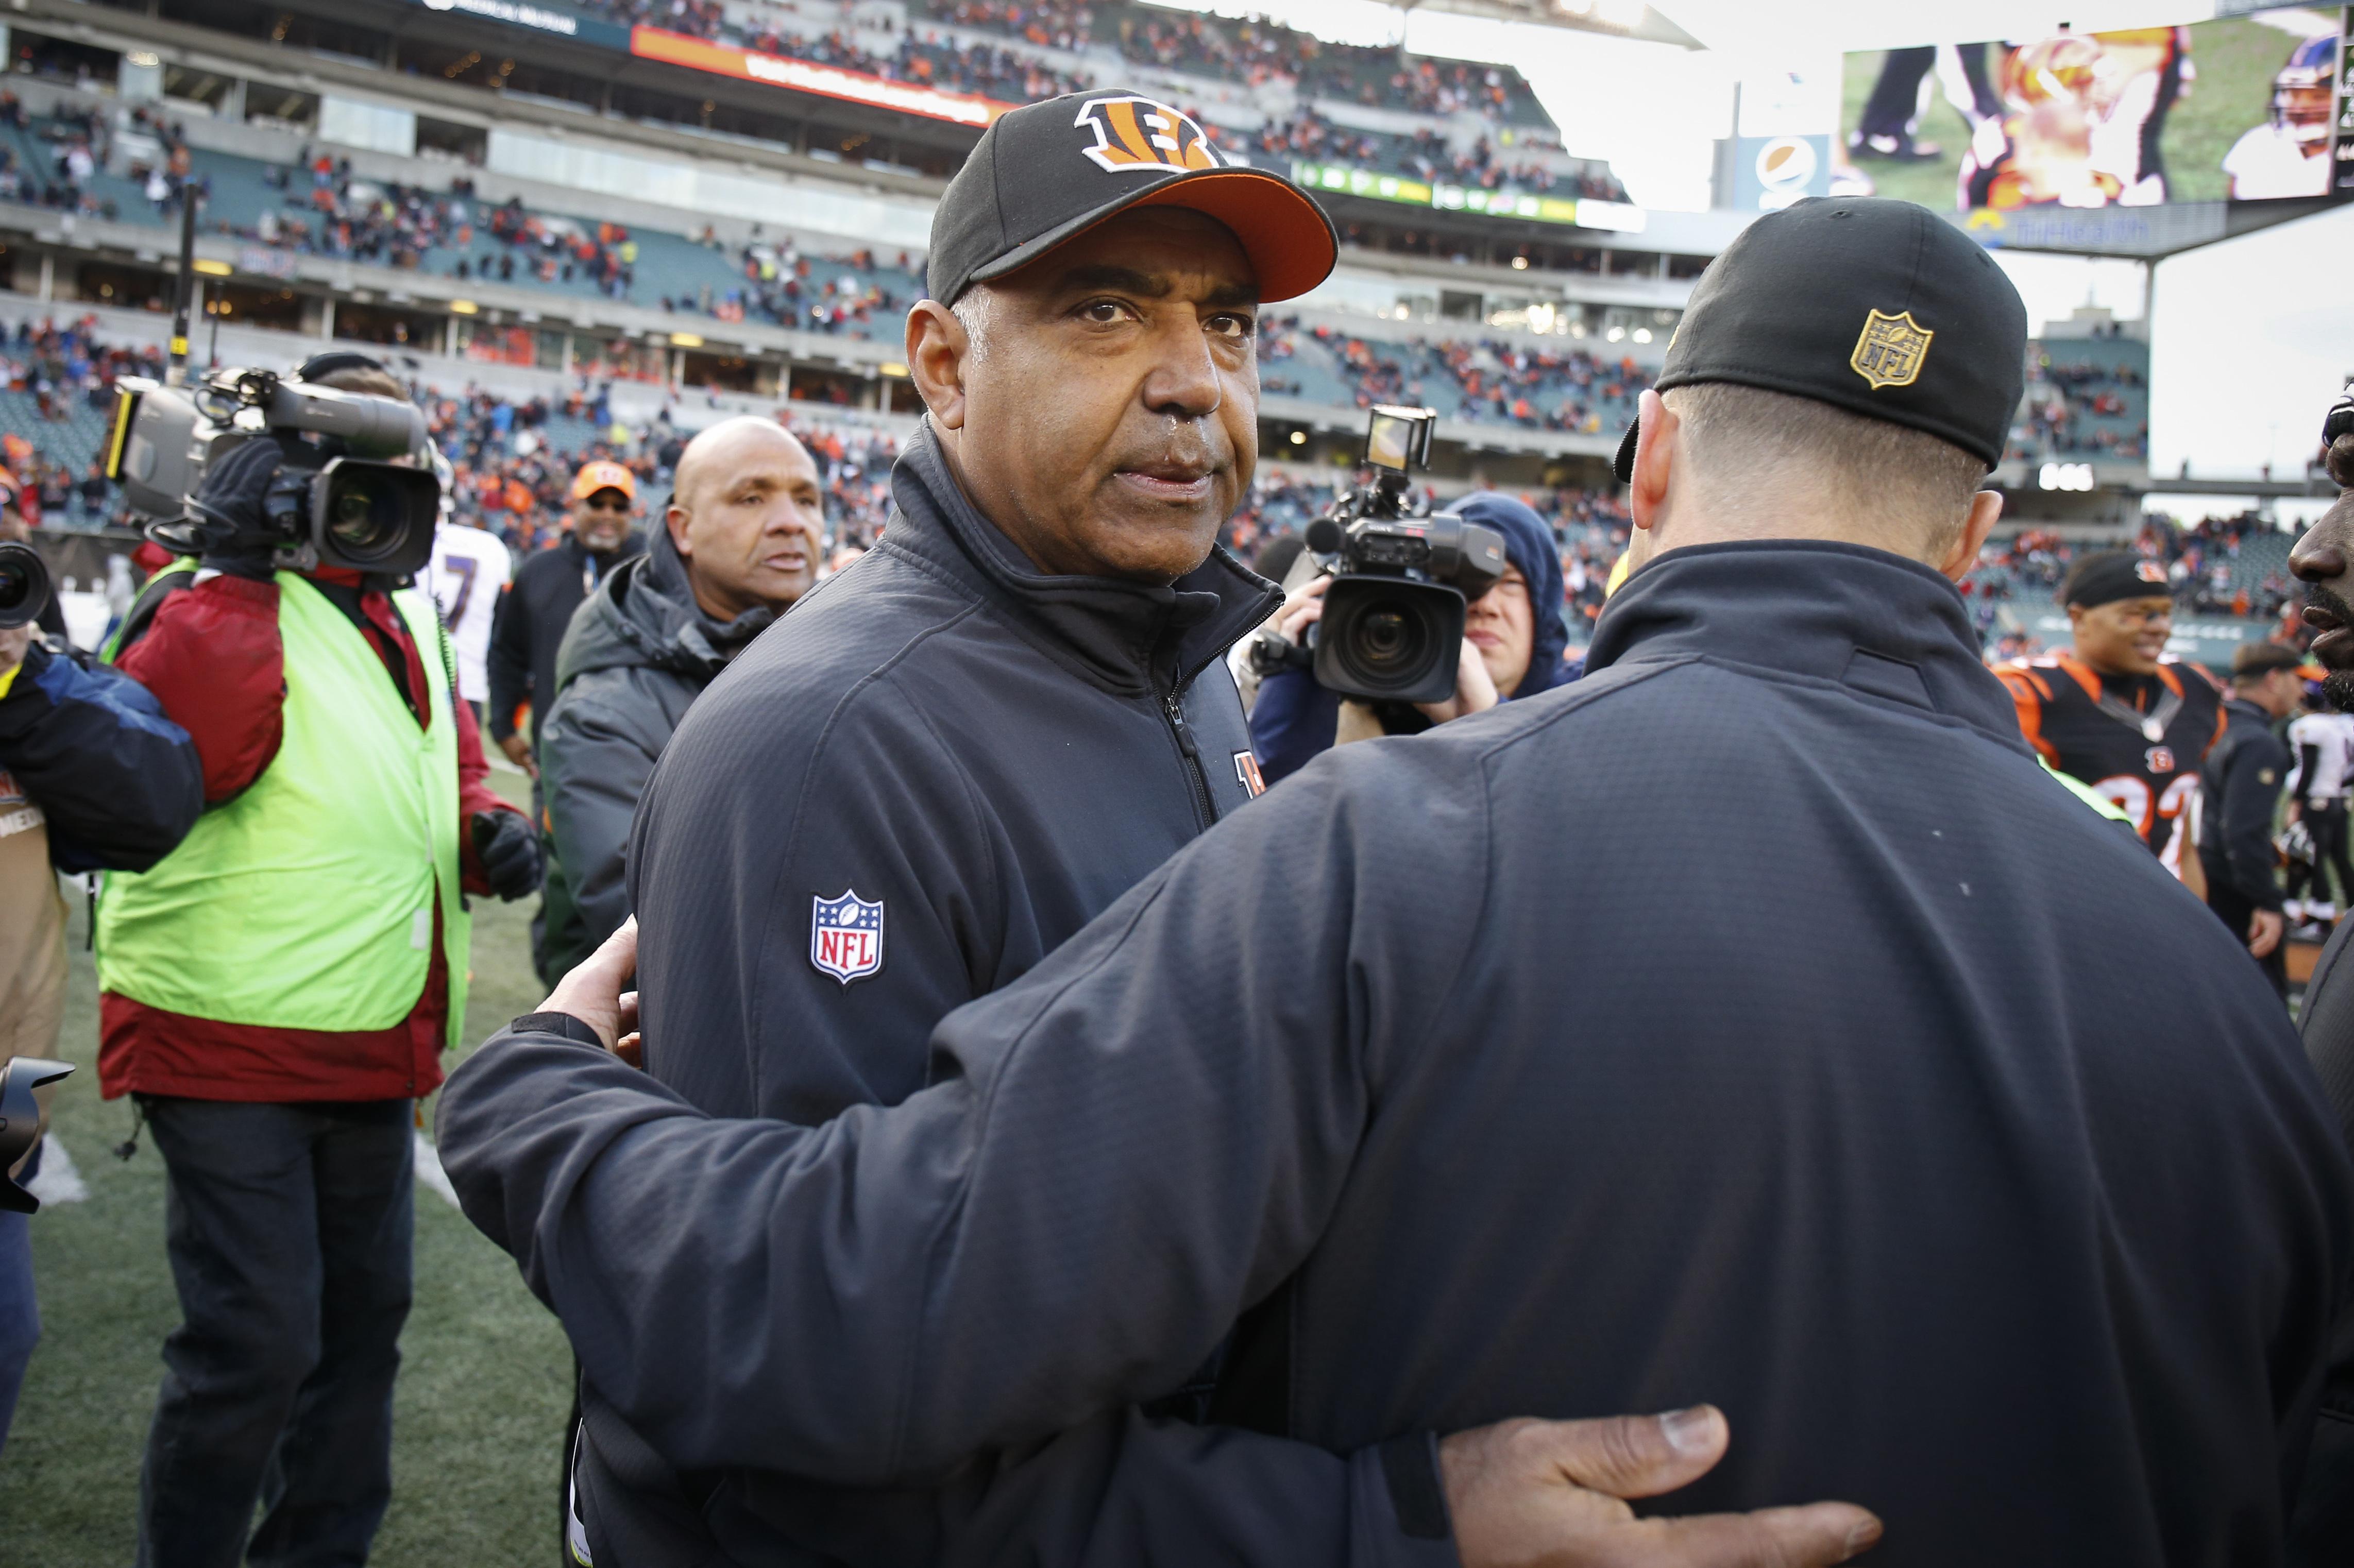 Cincinnati Bengals head coach Marvin Lewis meets with Baltimore Ravens head coach John Harbaugh, right, after an NFL football game, Sunday, Jan. 3, 2016, in Cincinnati. Cincinnati won 24-16. (AP Photo/Gary Landers)